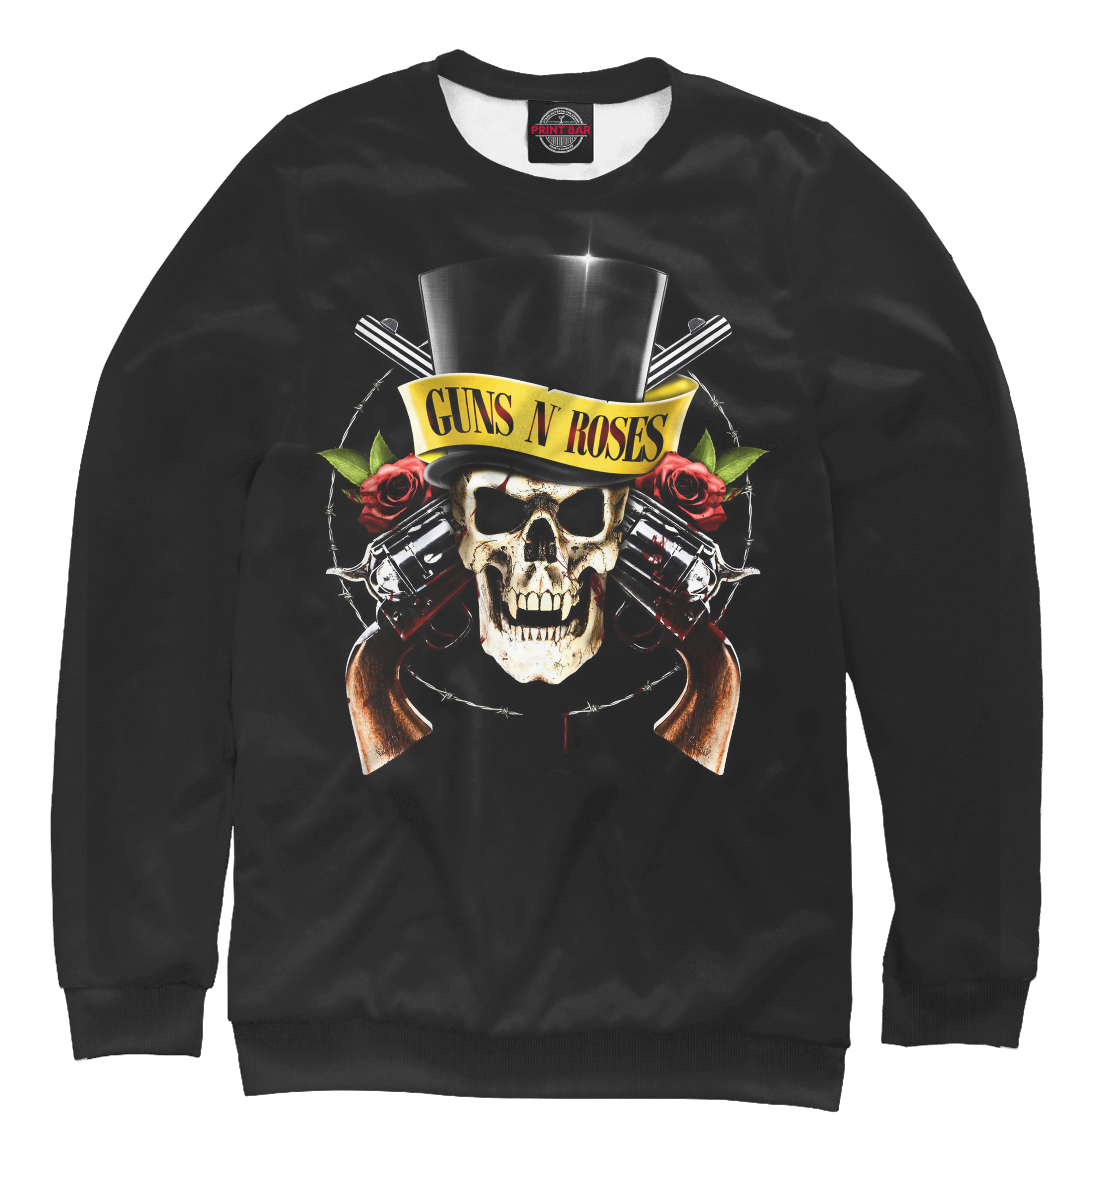 Купить Guns N' Roses, Printbar, Свитшоты, MZK-724489-swi-2